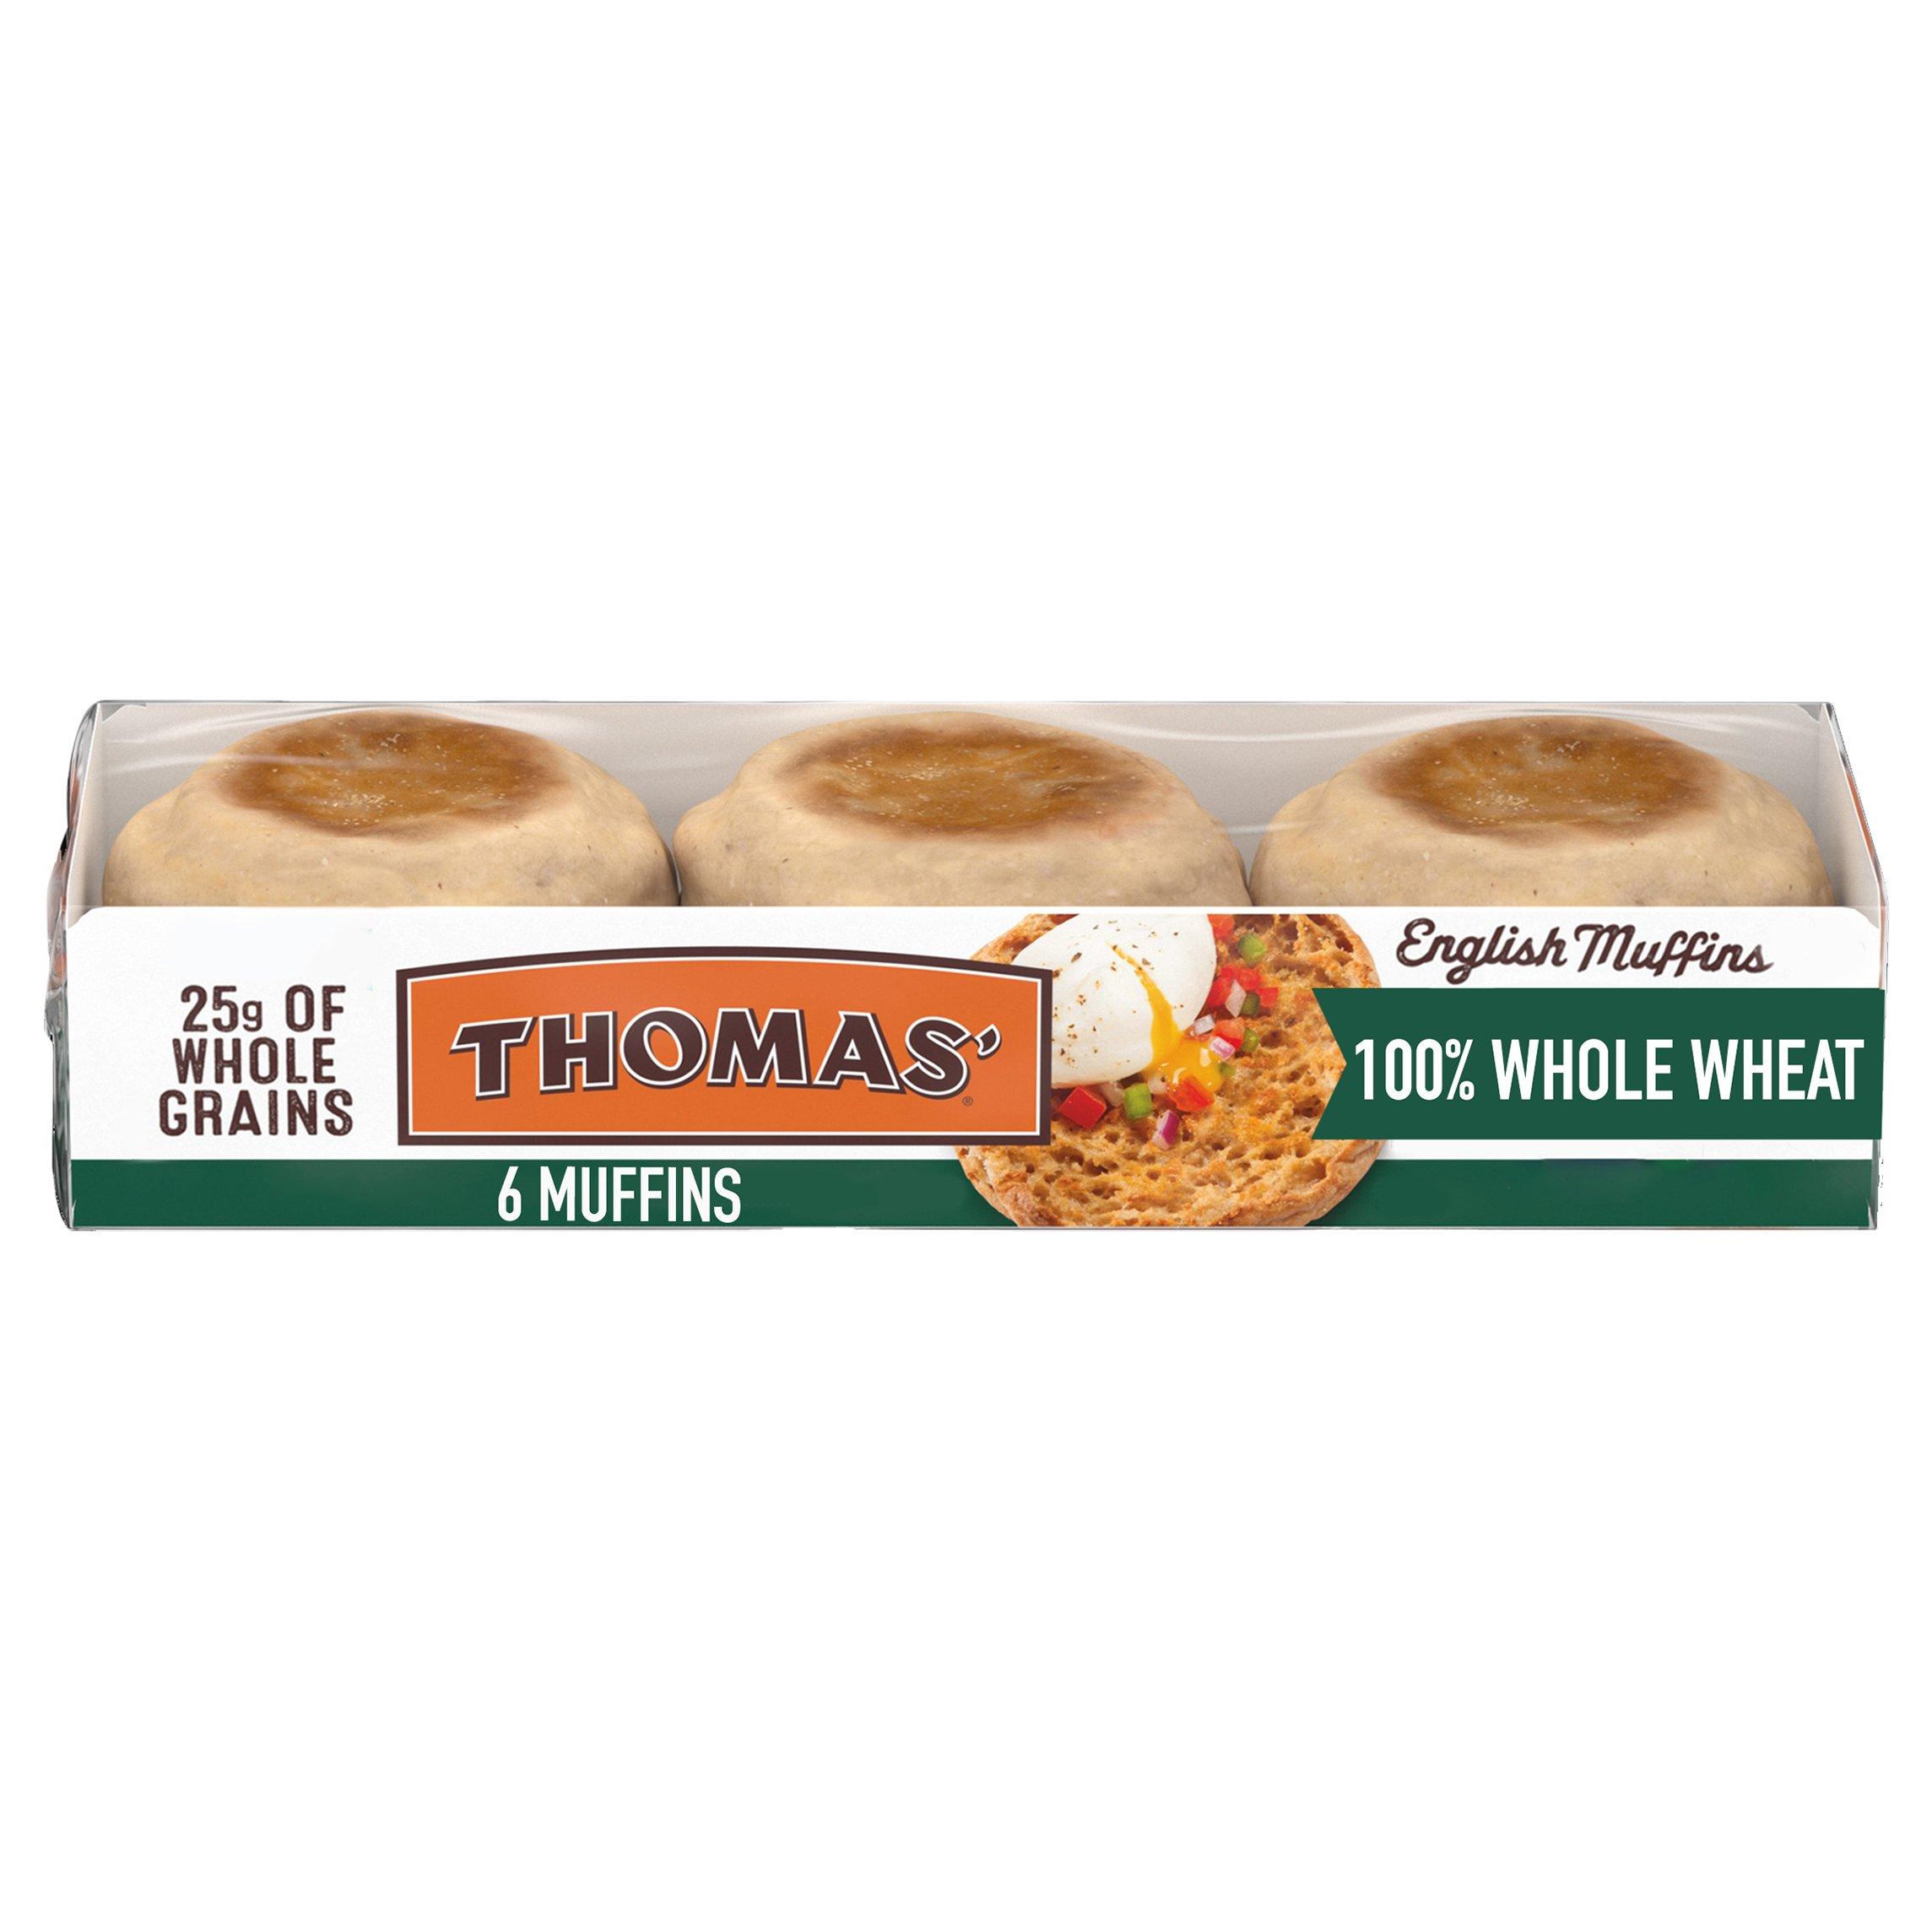 Thomas 100 Whole Wheat English Muffins Shop Bread At H E B